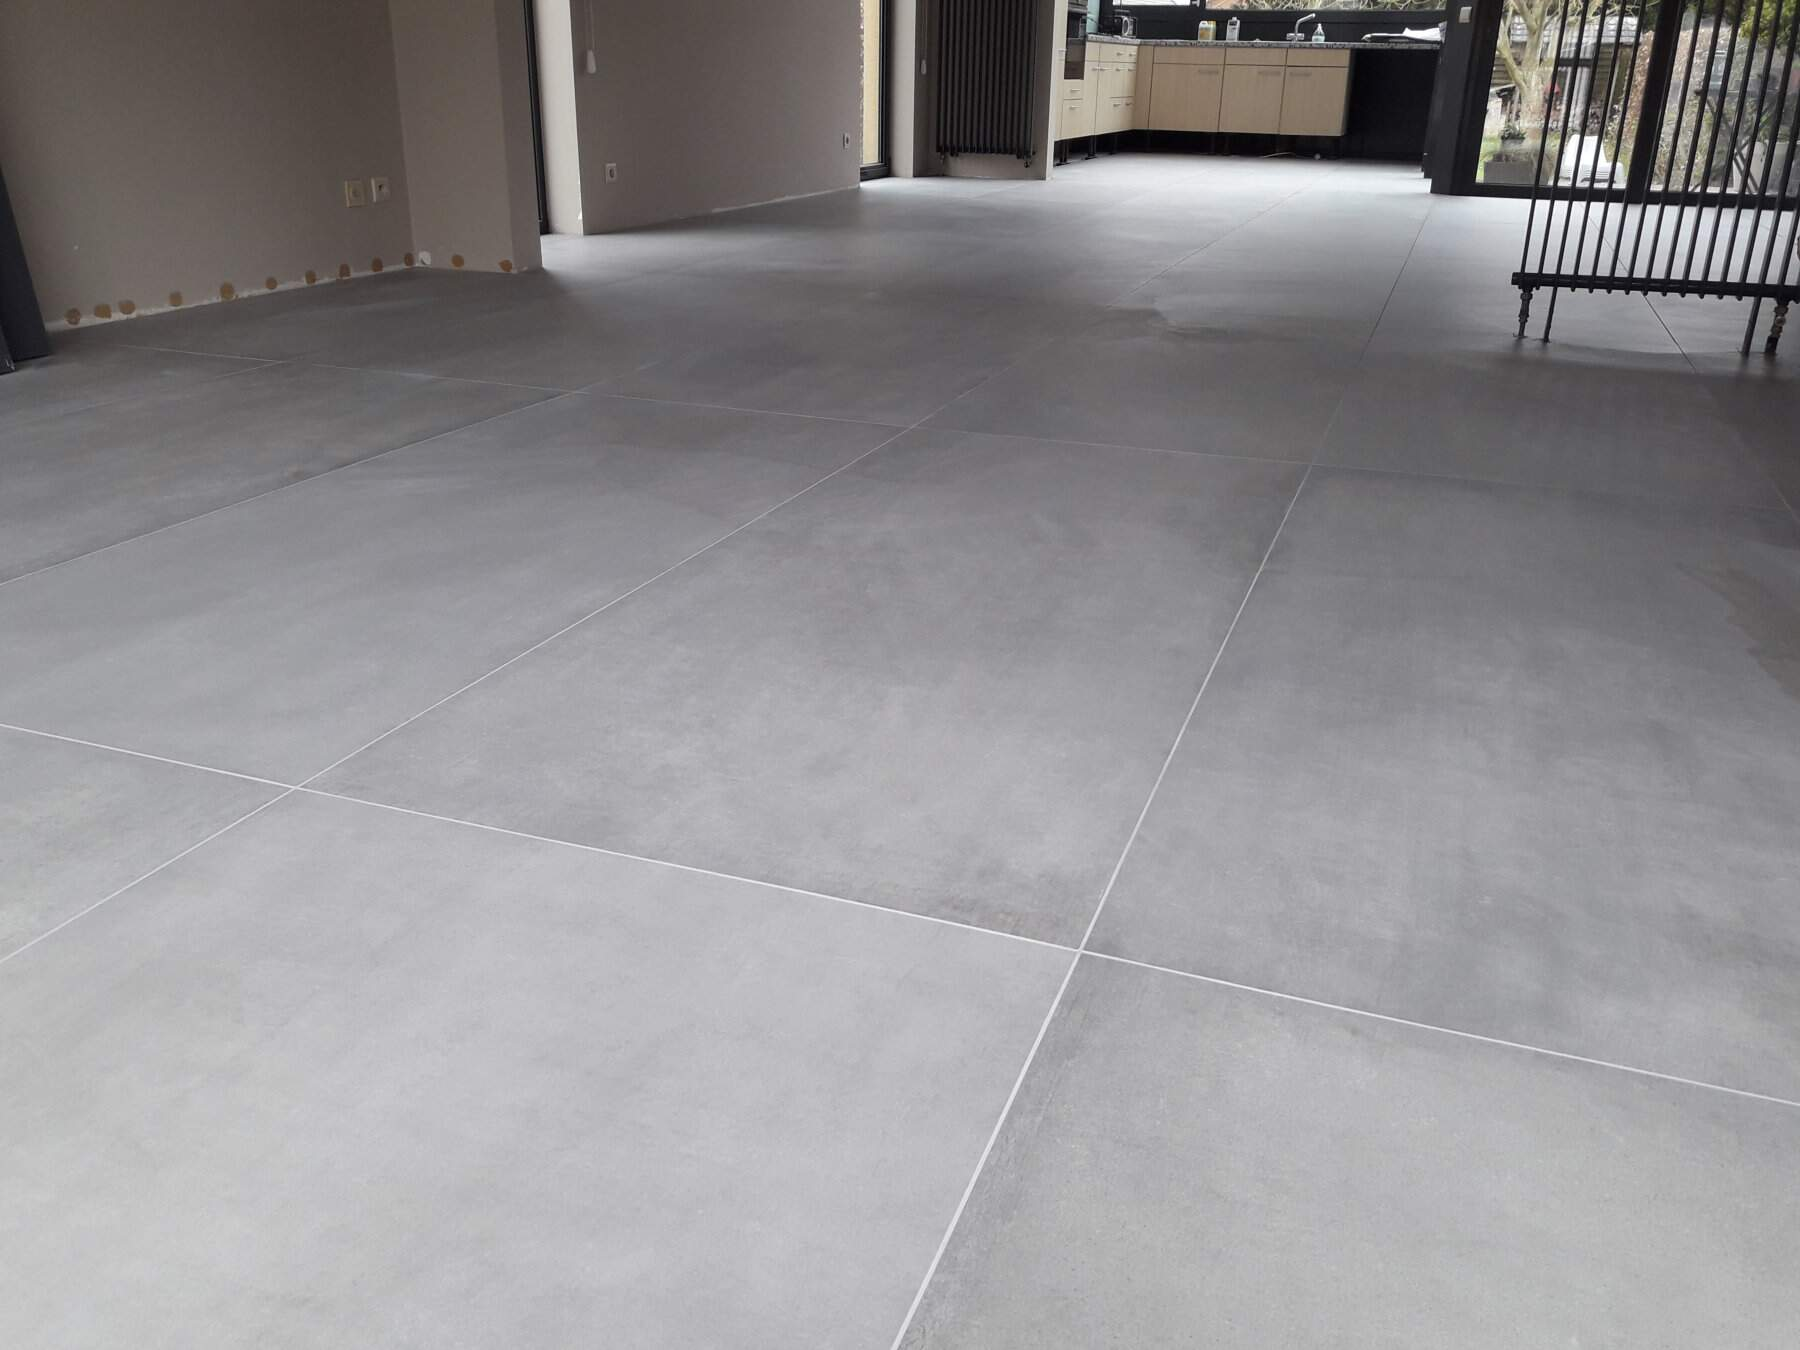 Kronos PM betonlook